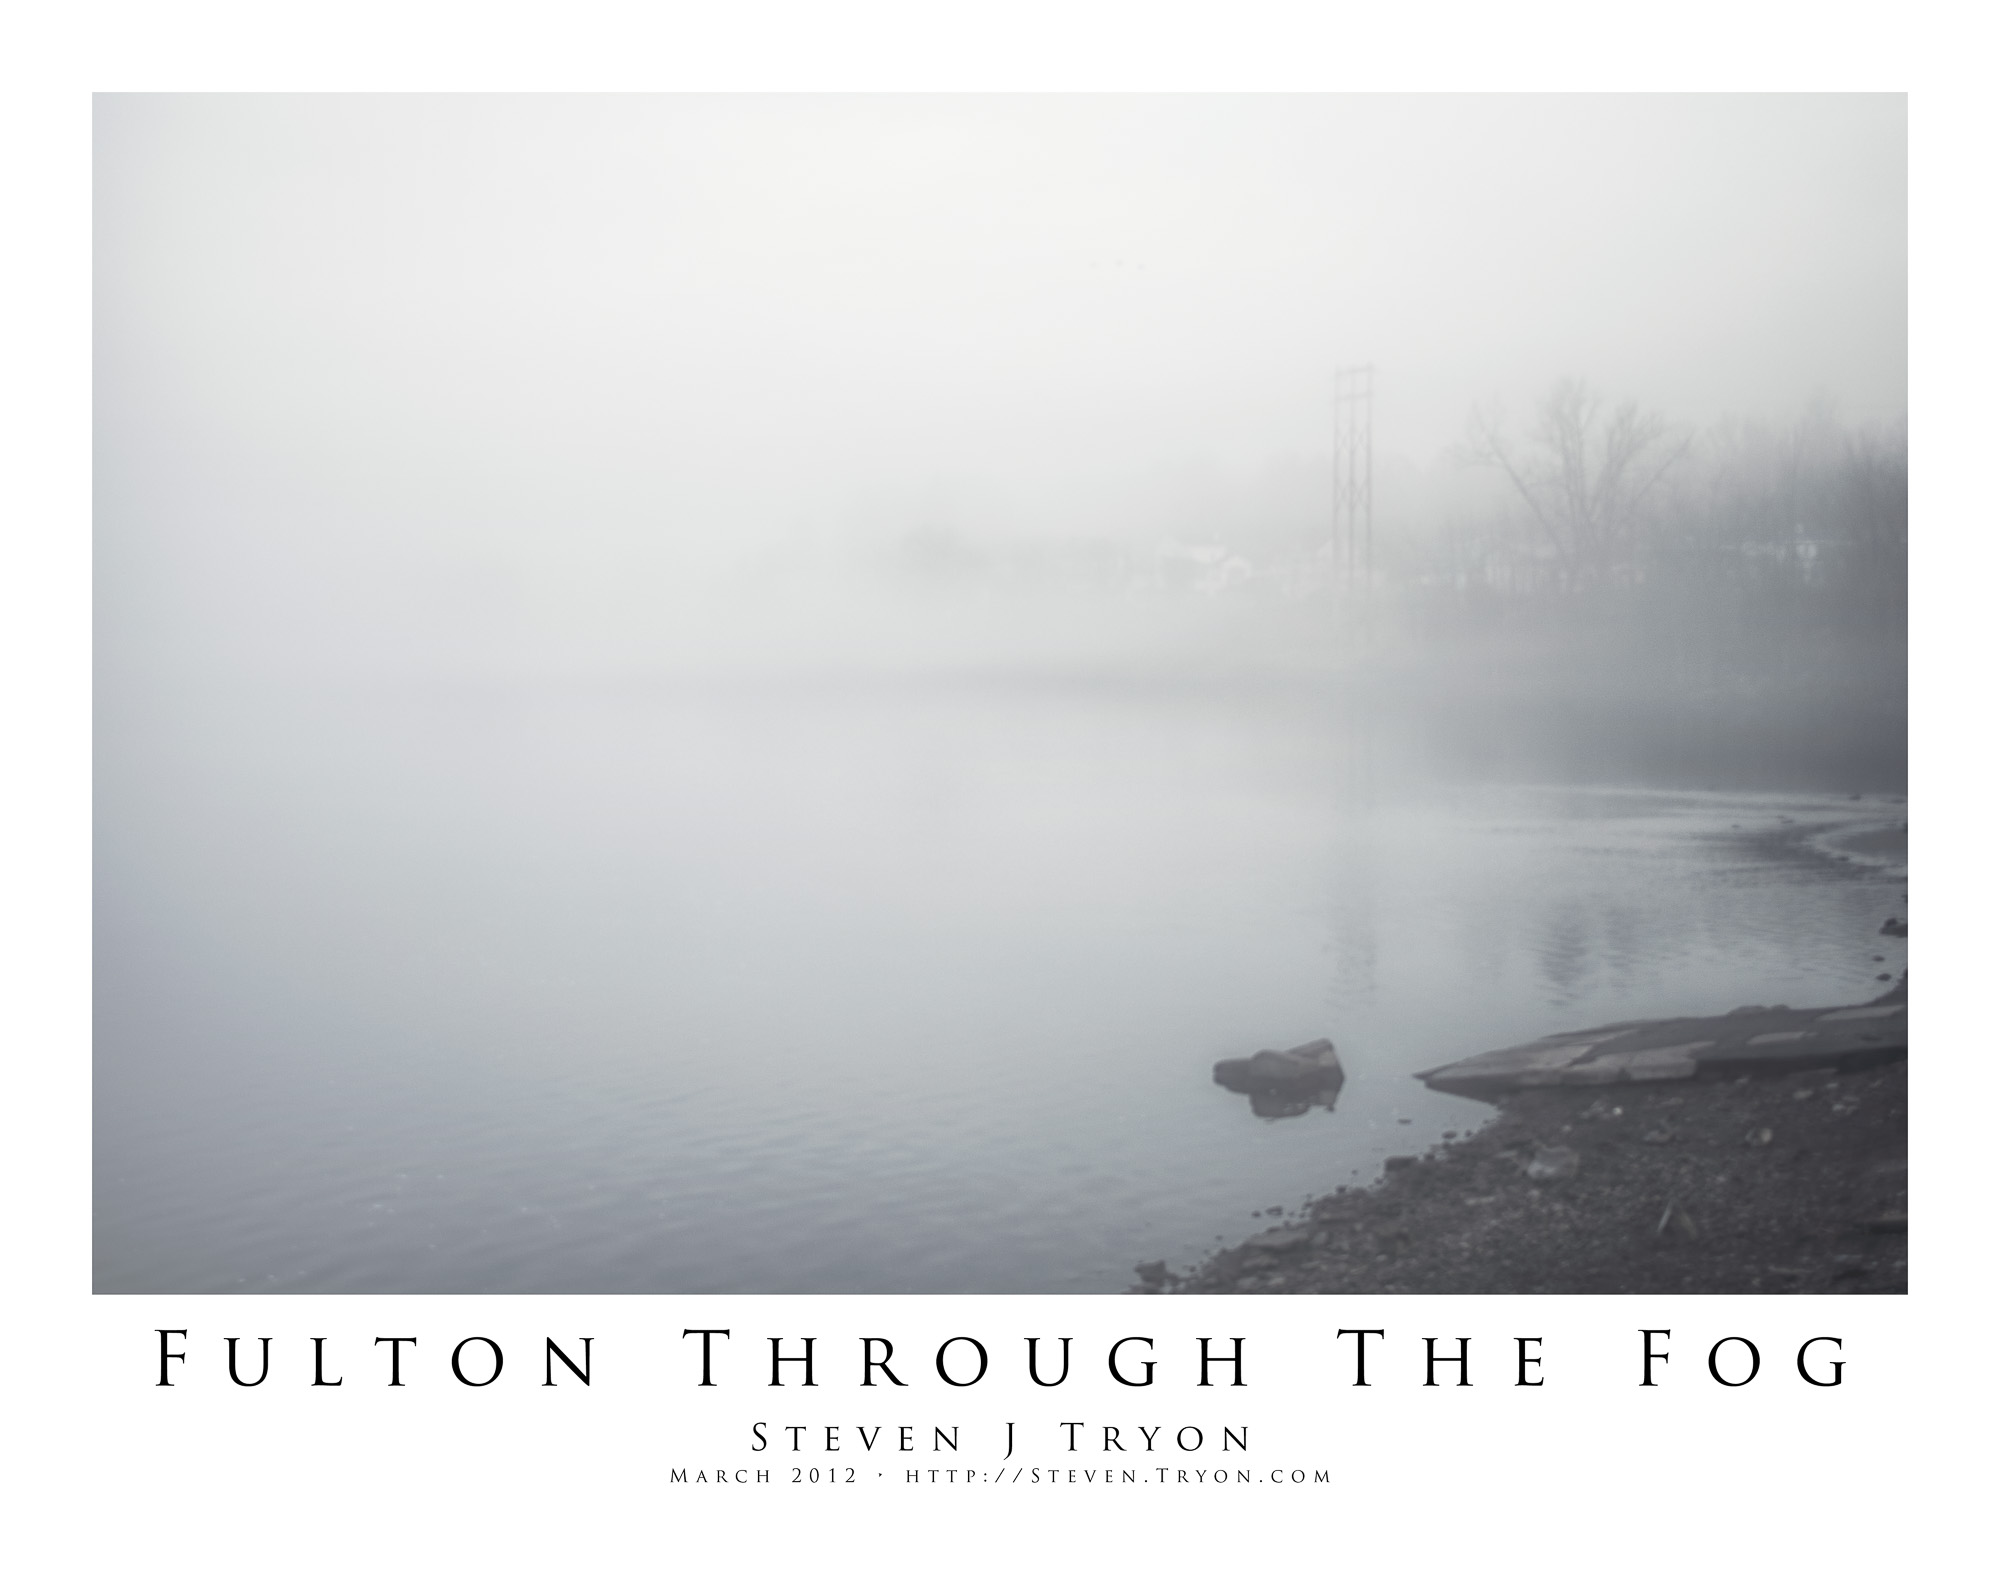 Fulton Through The Fog